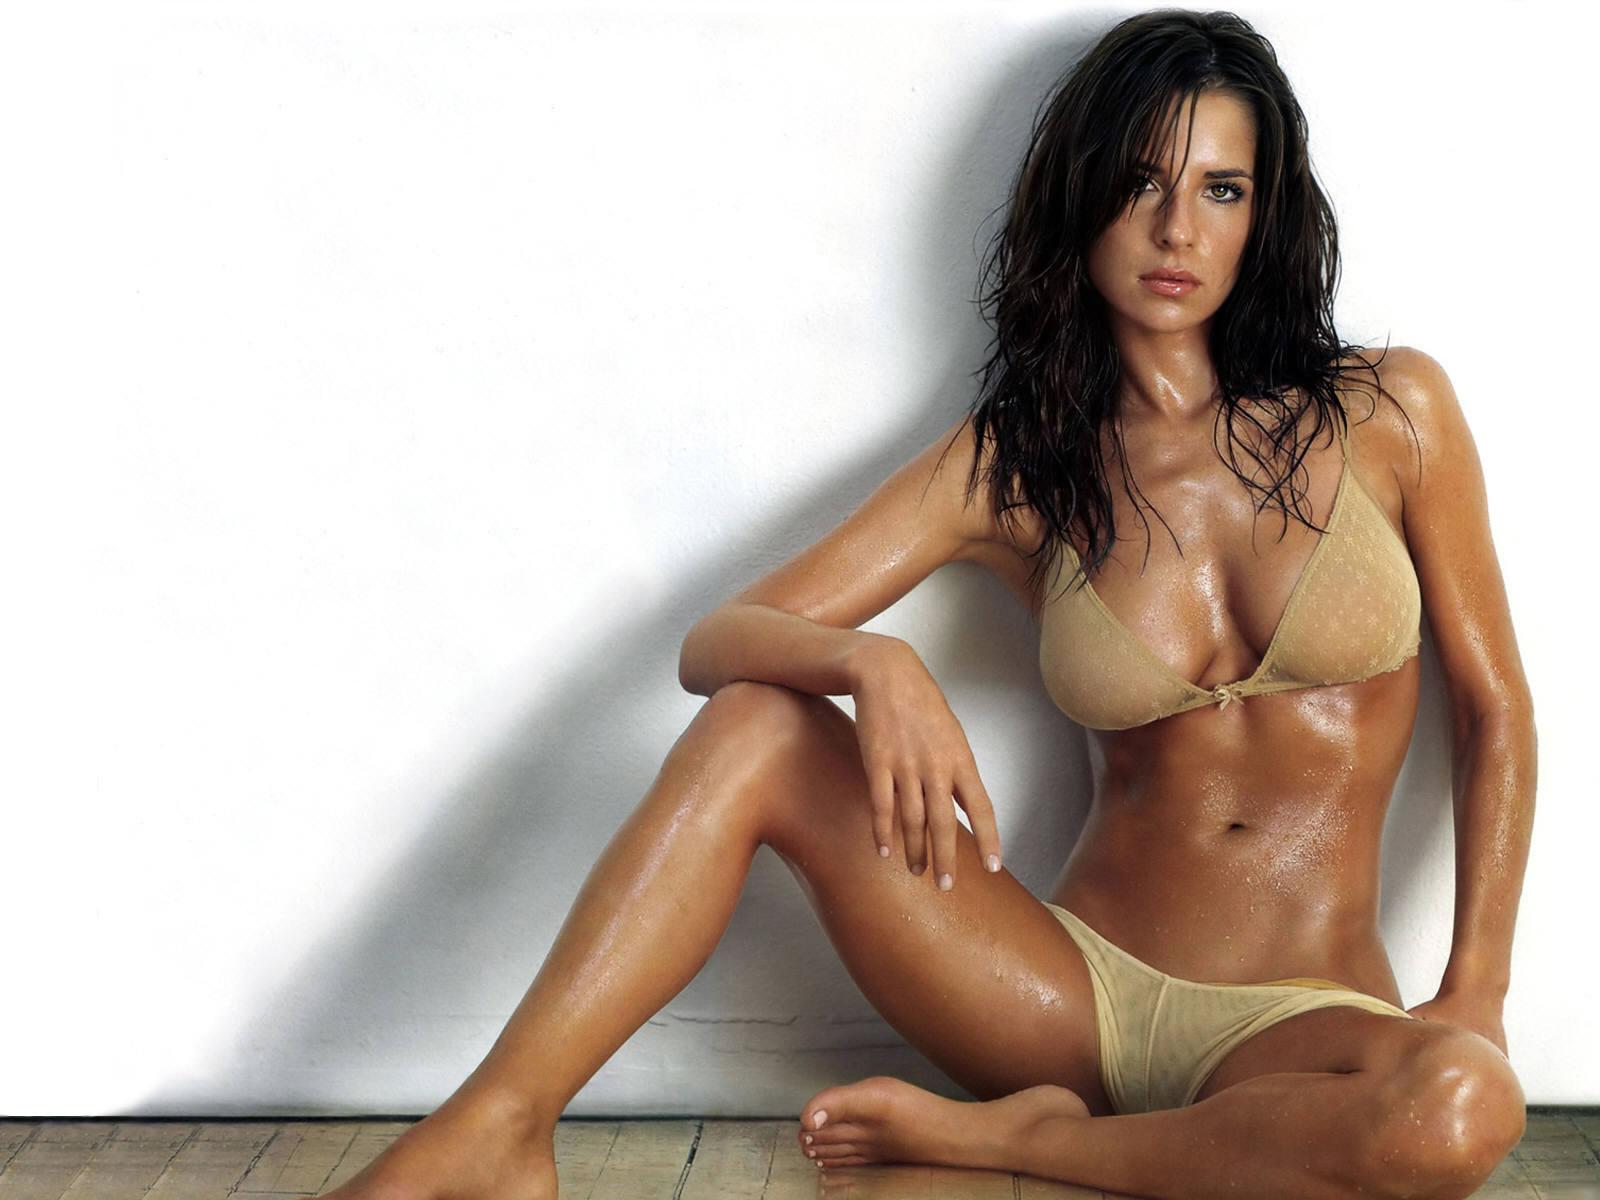 wallpapershdsize: Sexy Global / Hollywood Actress, HD Sexy